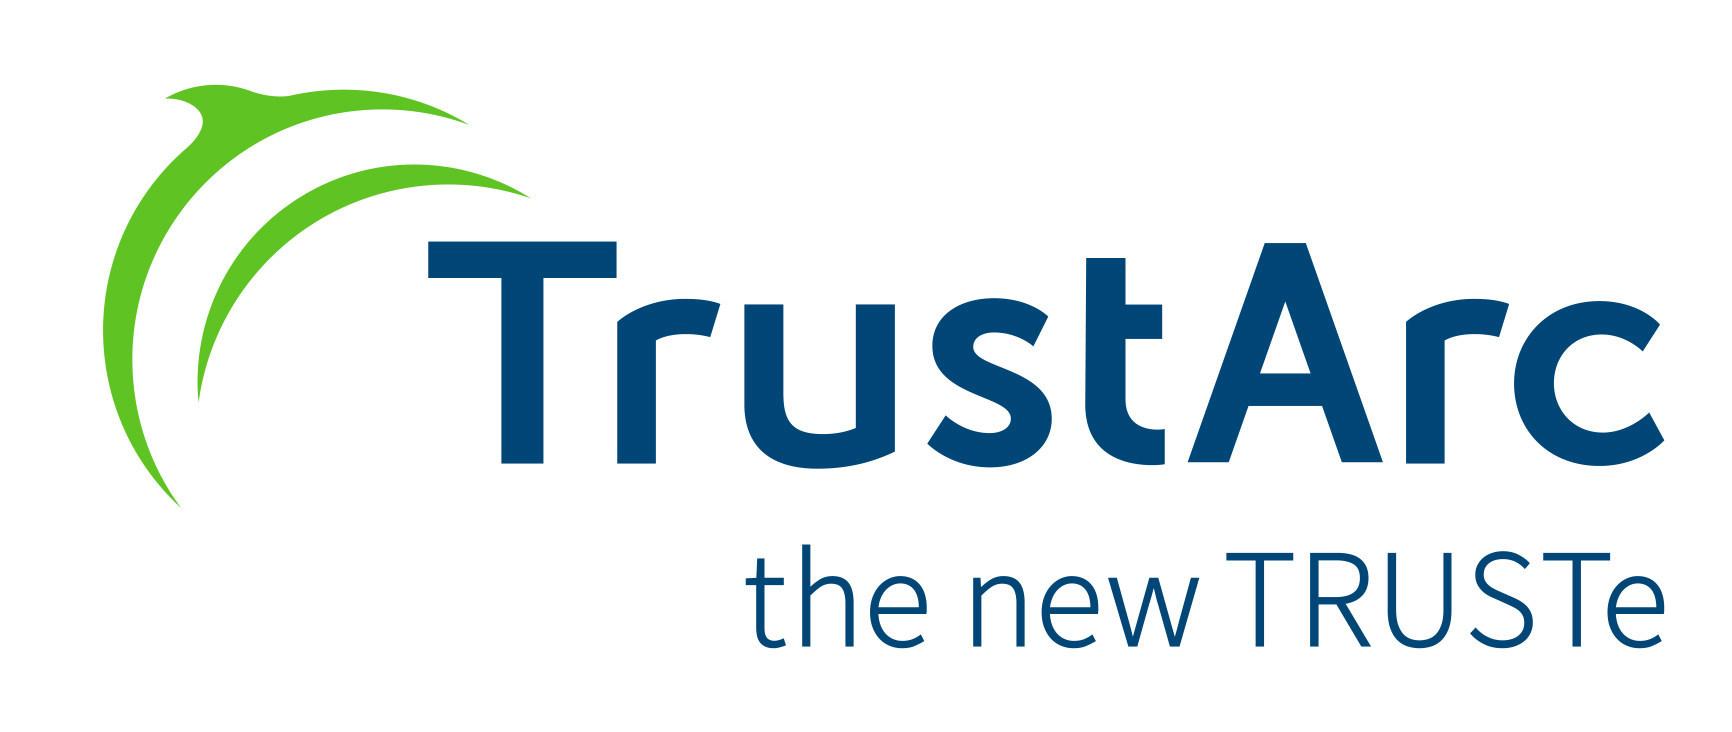 Truste Cretified Privacy